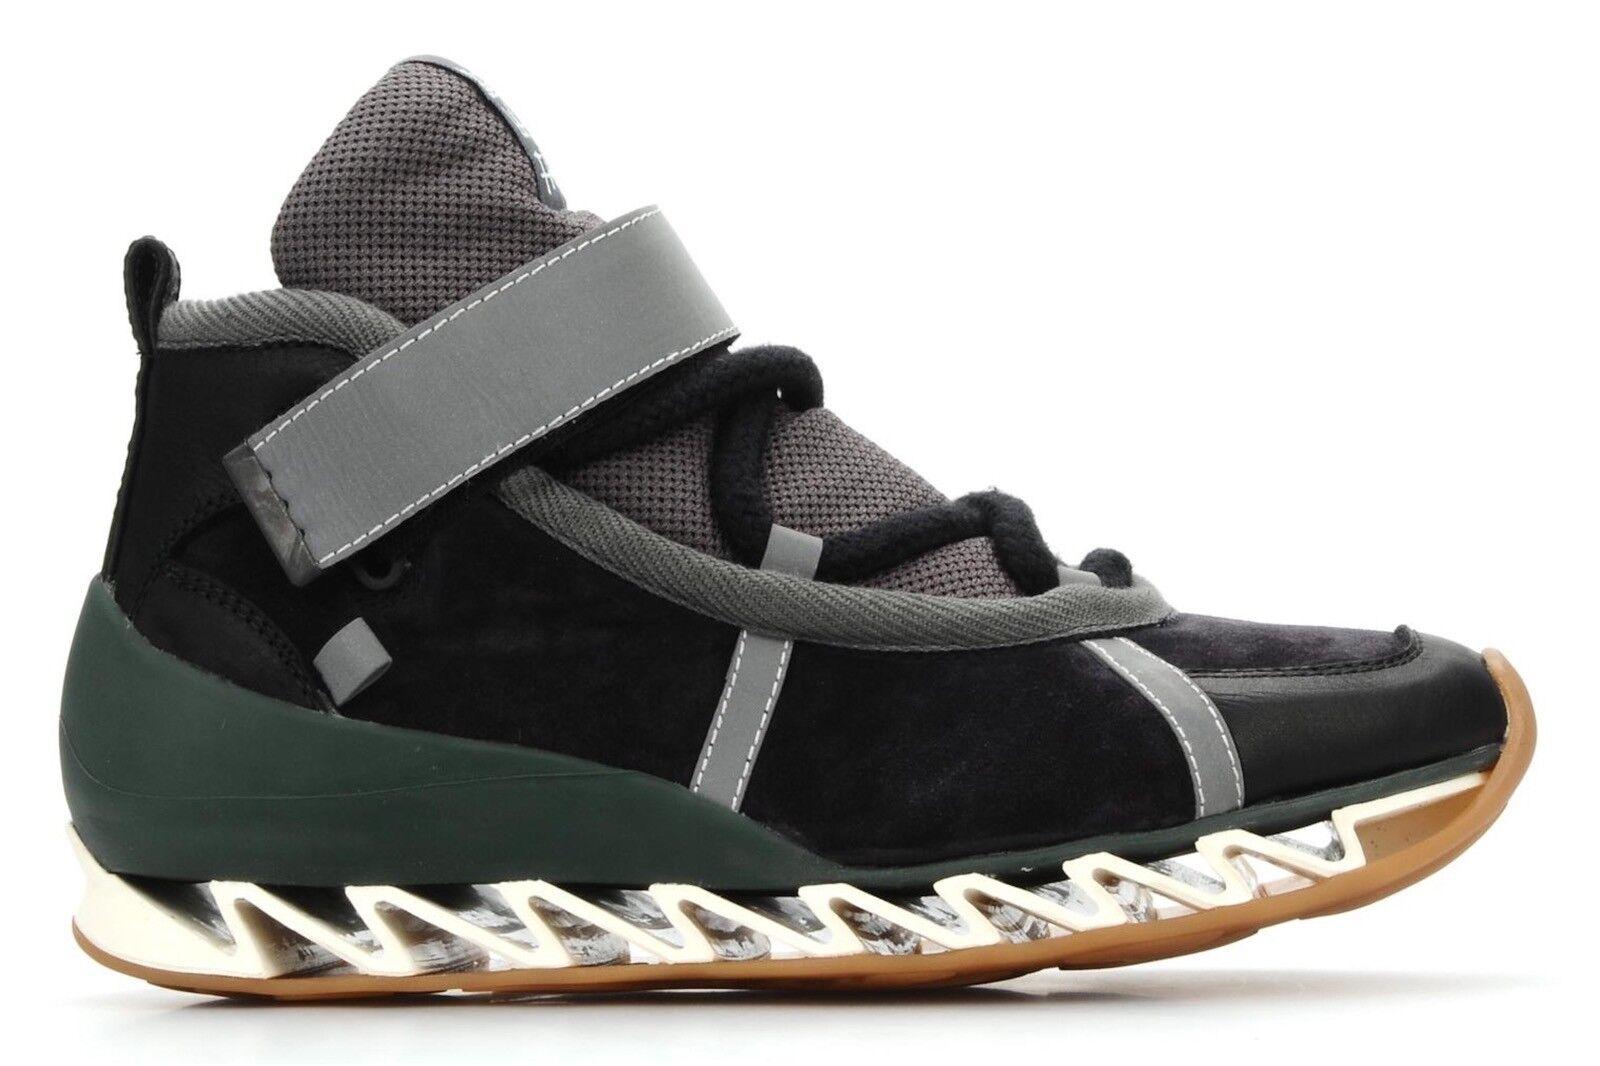 320 Bernhard Willhelm X Camper US 7 EU 40 Together Himalayan Sneakers 36514-008